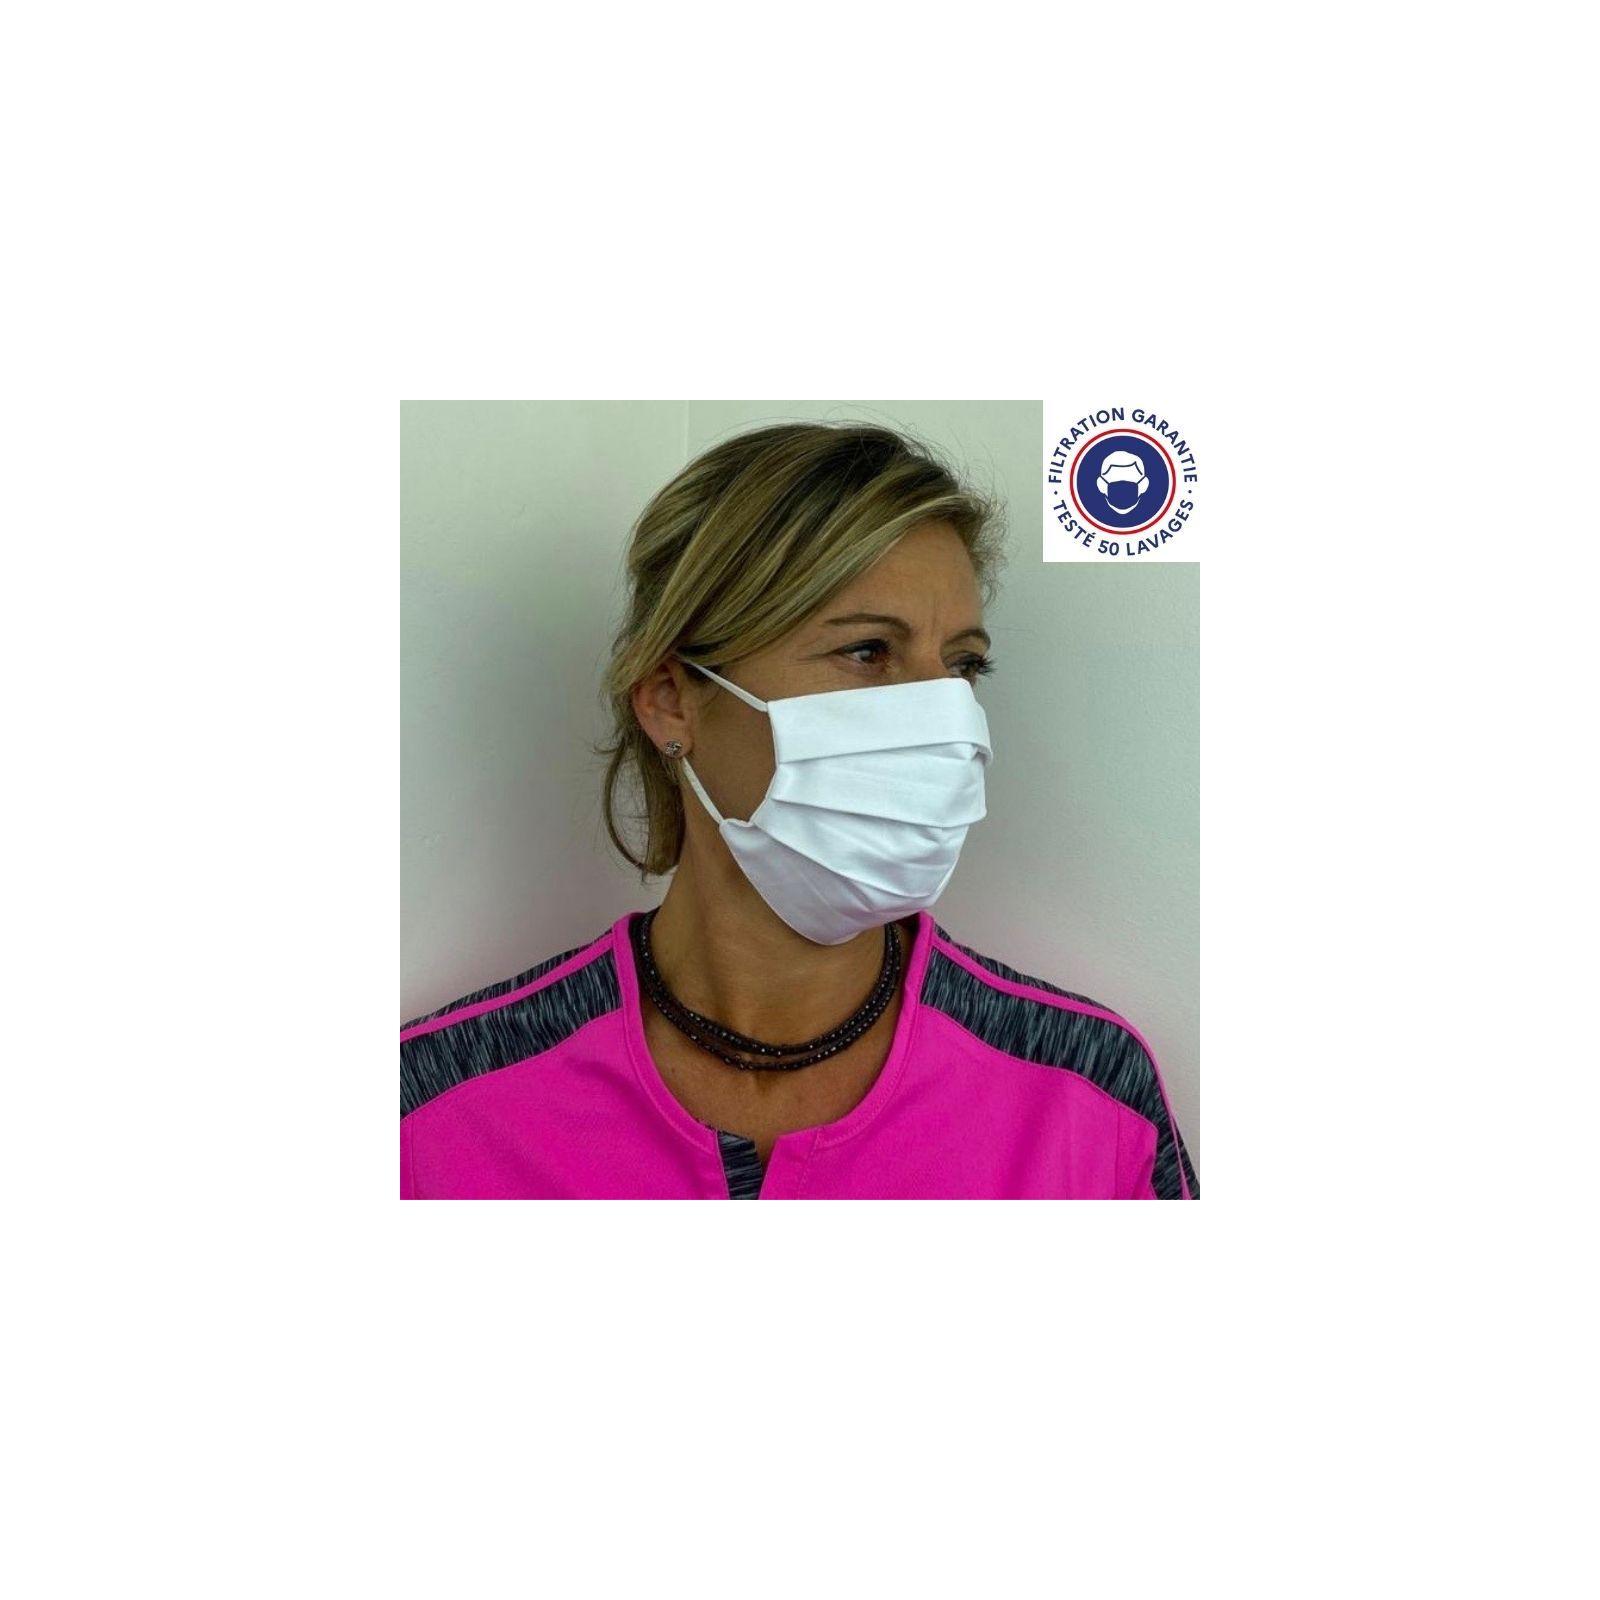 Lot 10 - Masque chirurgical de protection Unisexe (MASQUE10)